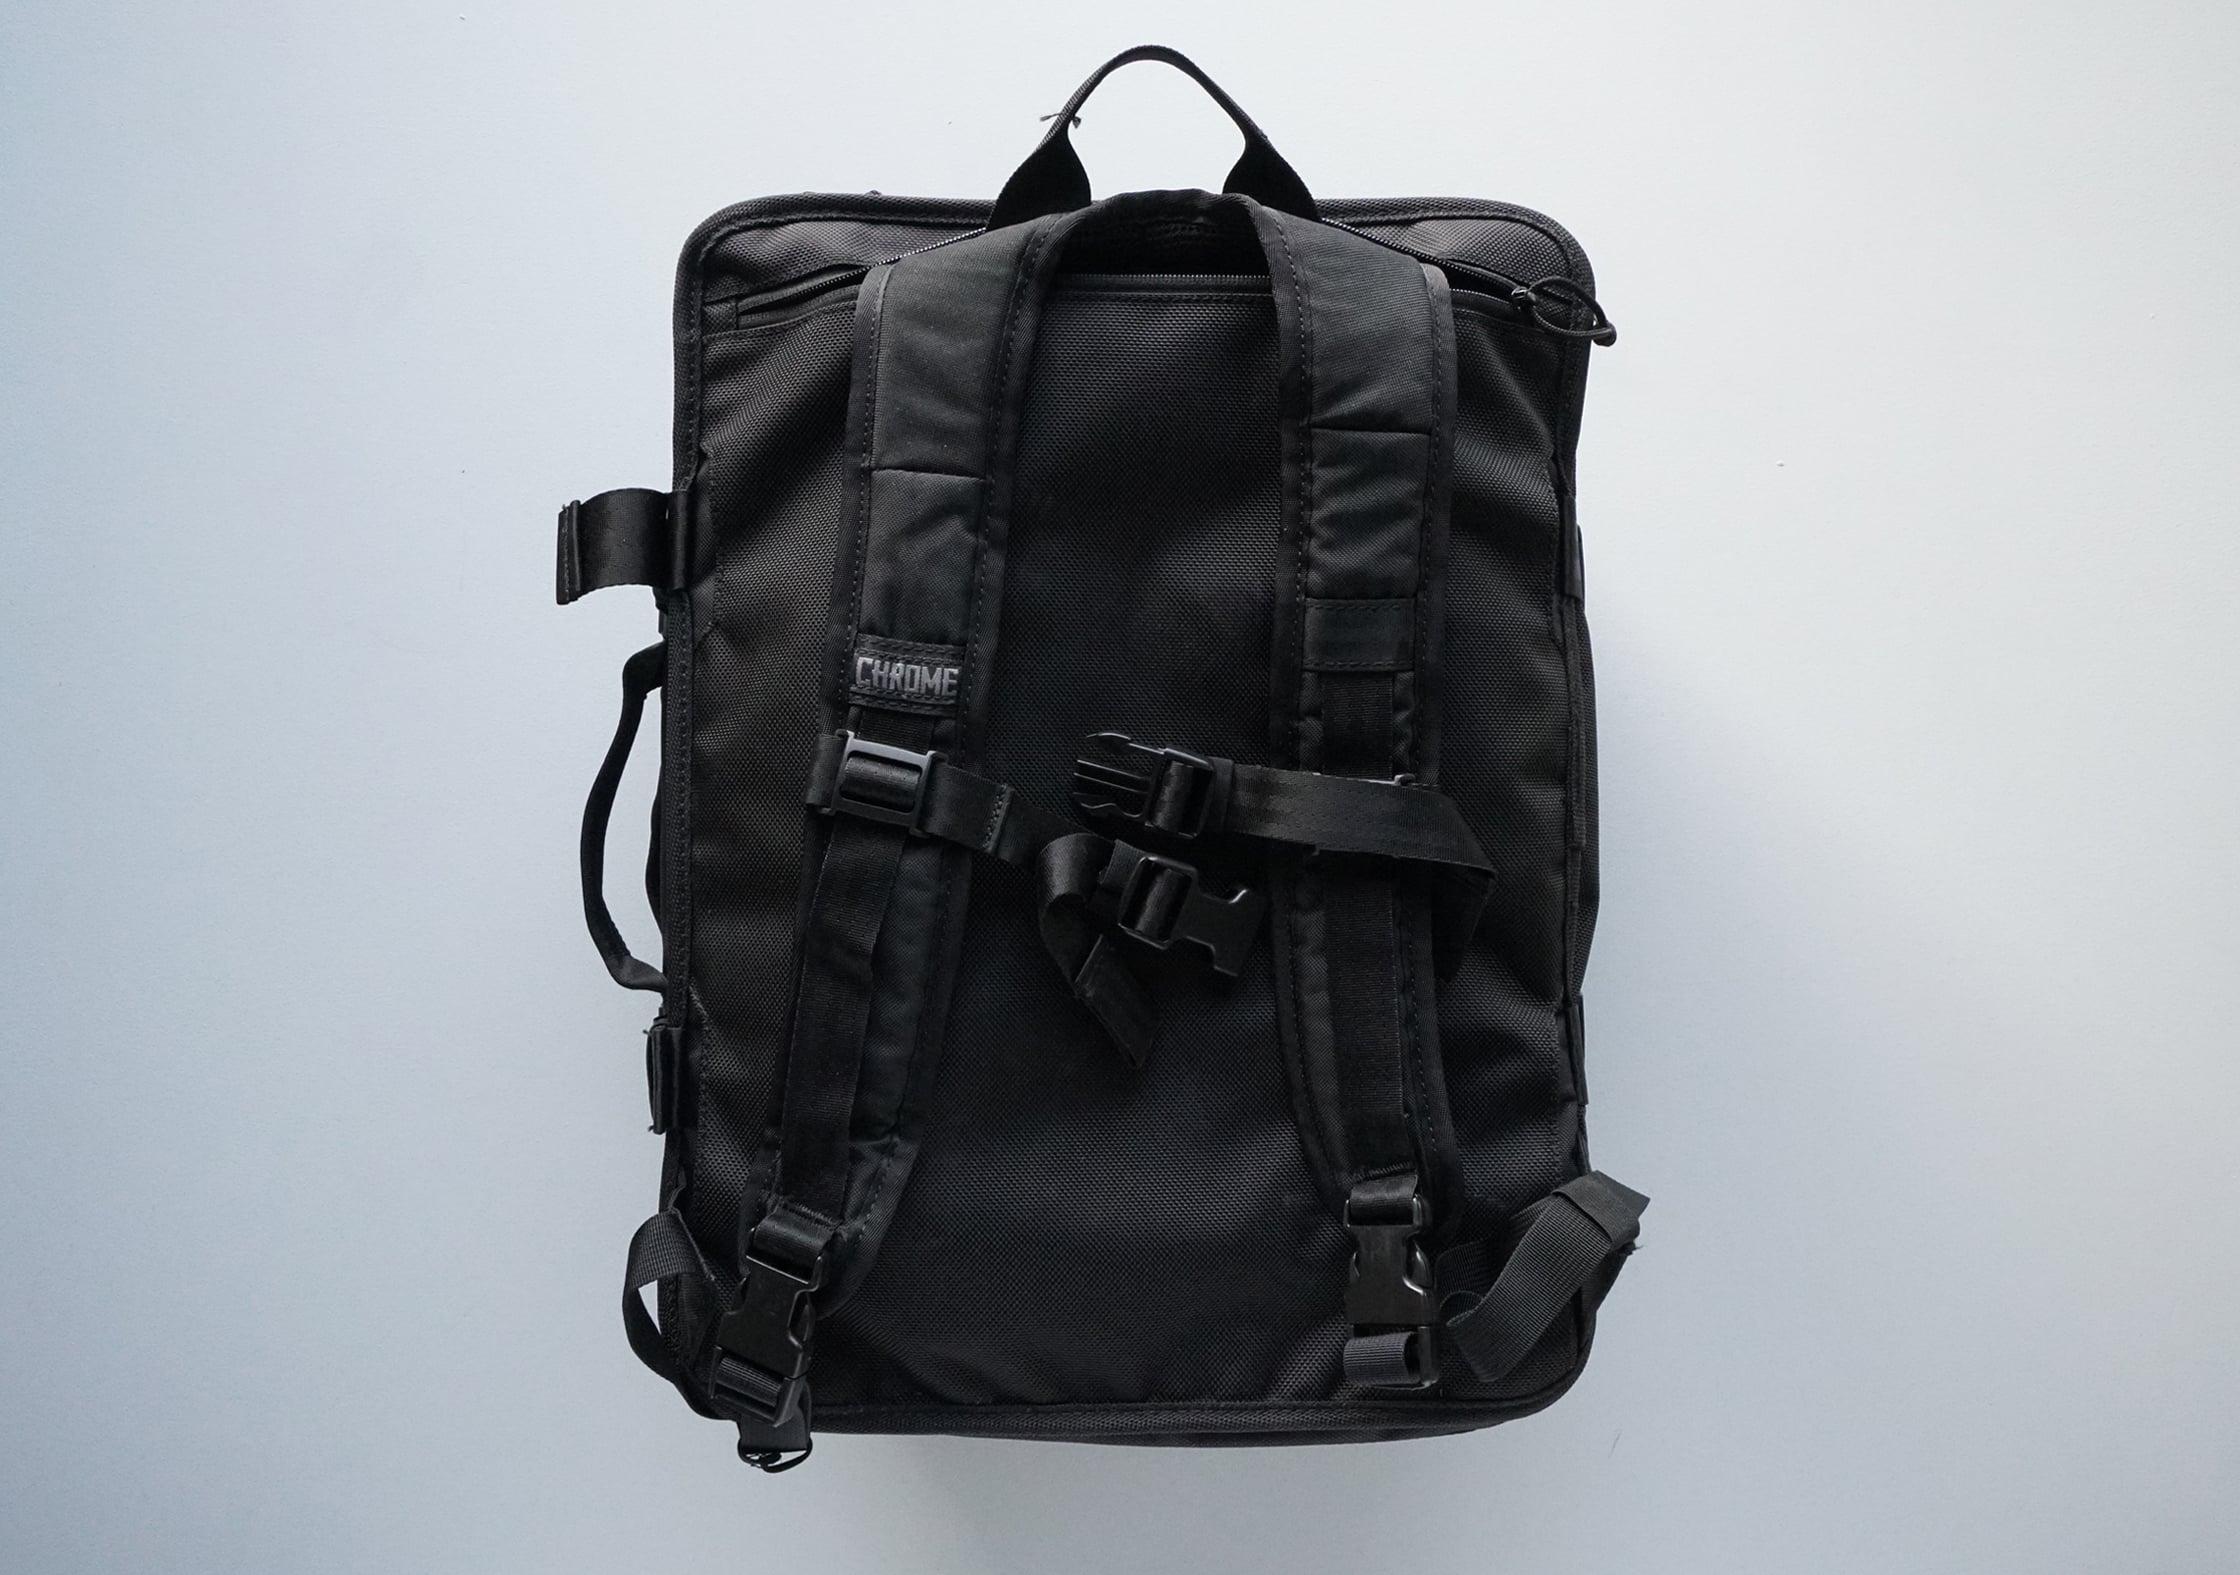 Chrome Macheto Travel Backpack Harness